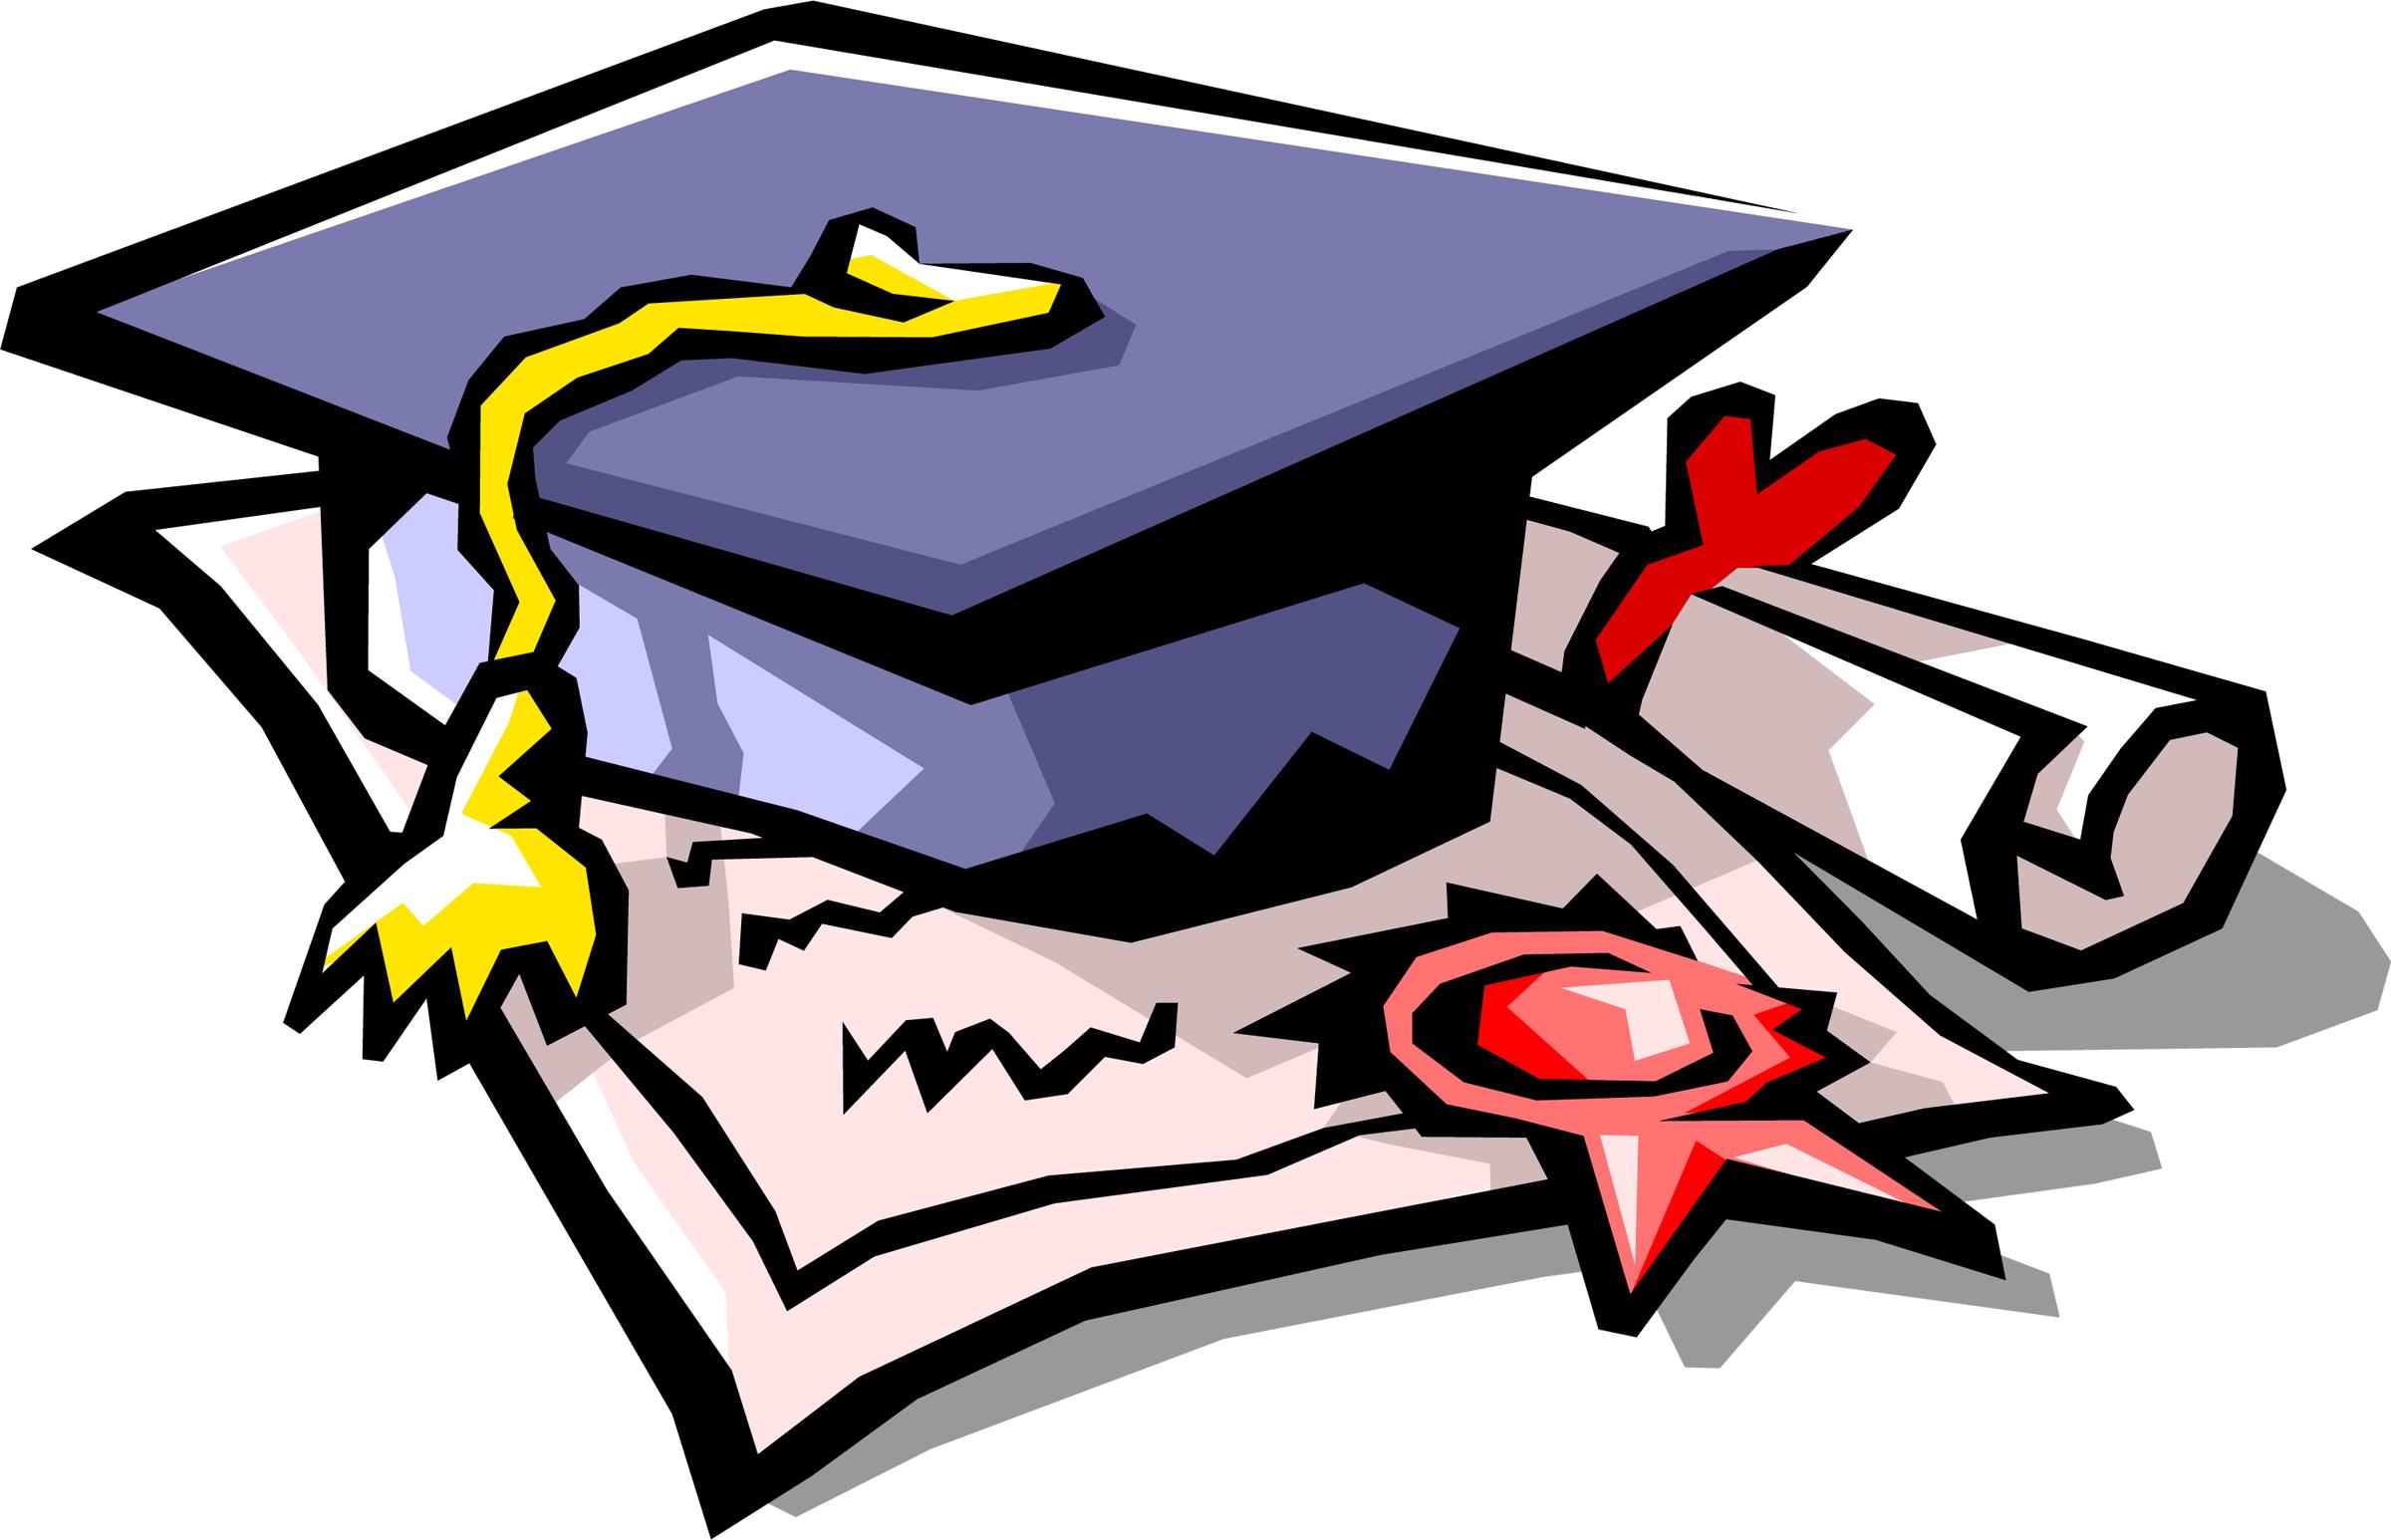 2400x1546 Ceremony Clipart Graduation Congratulation